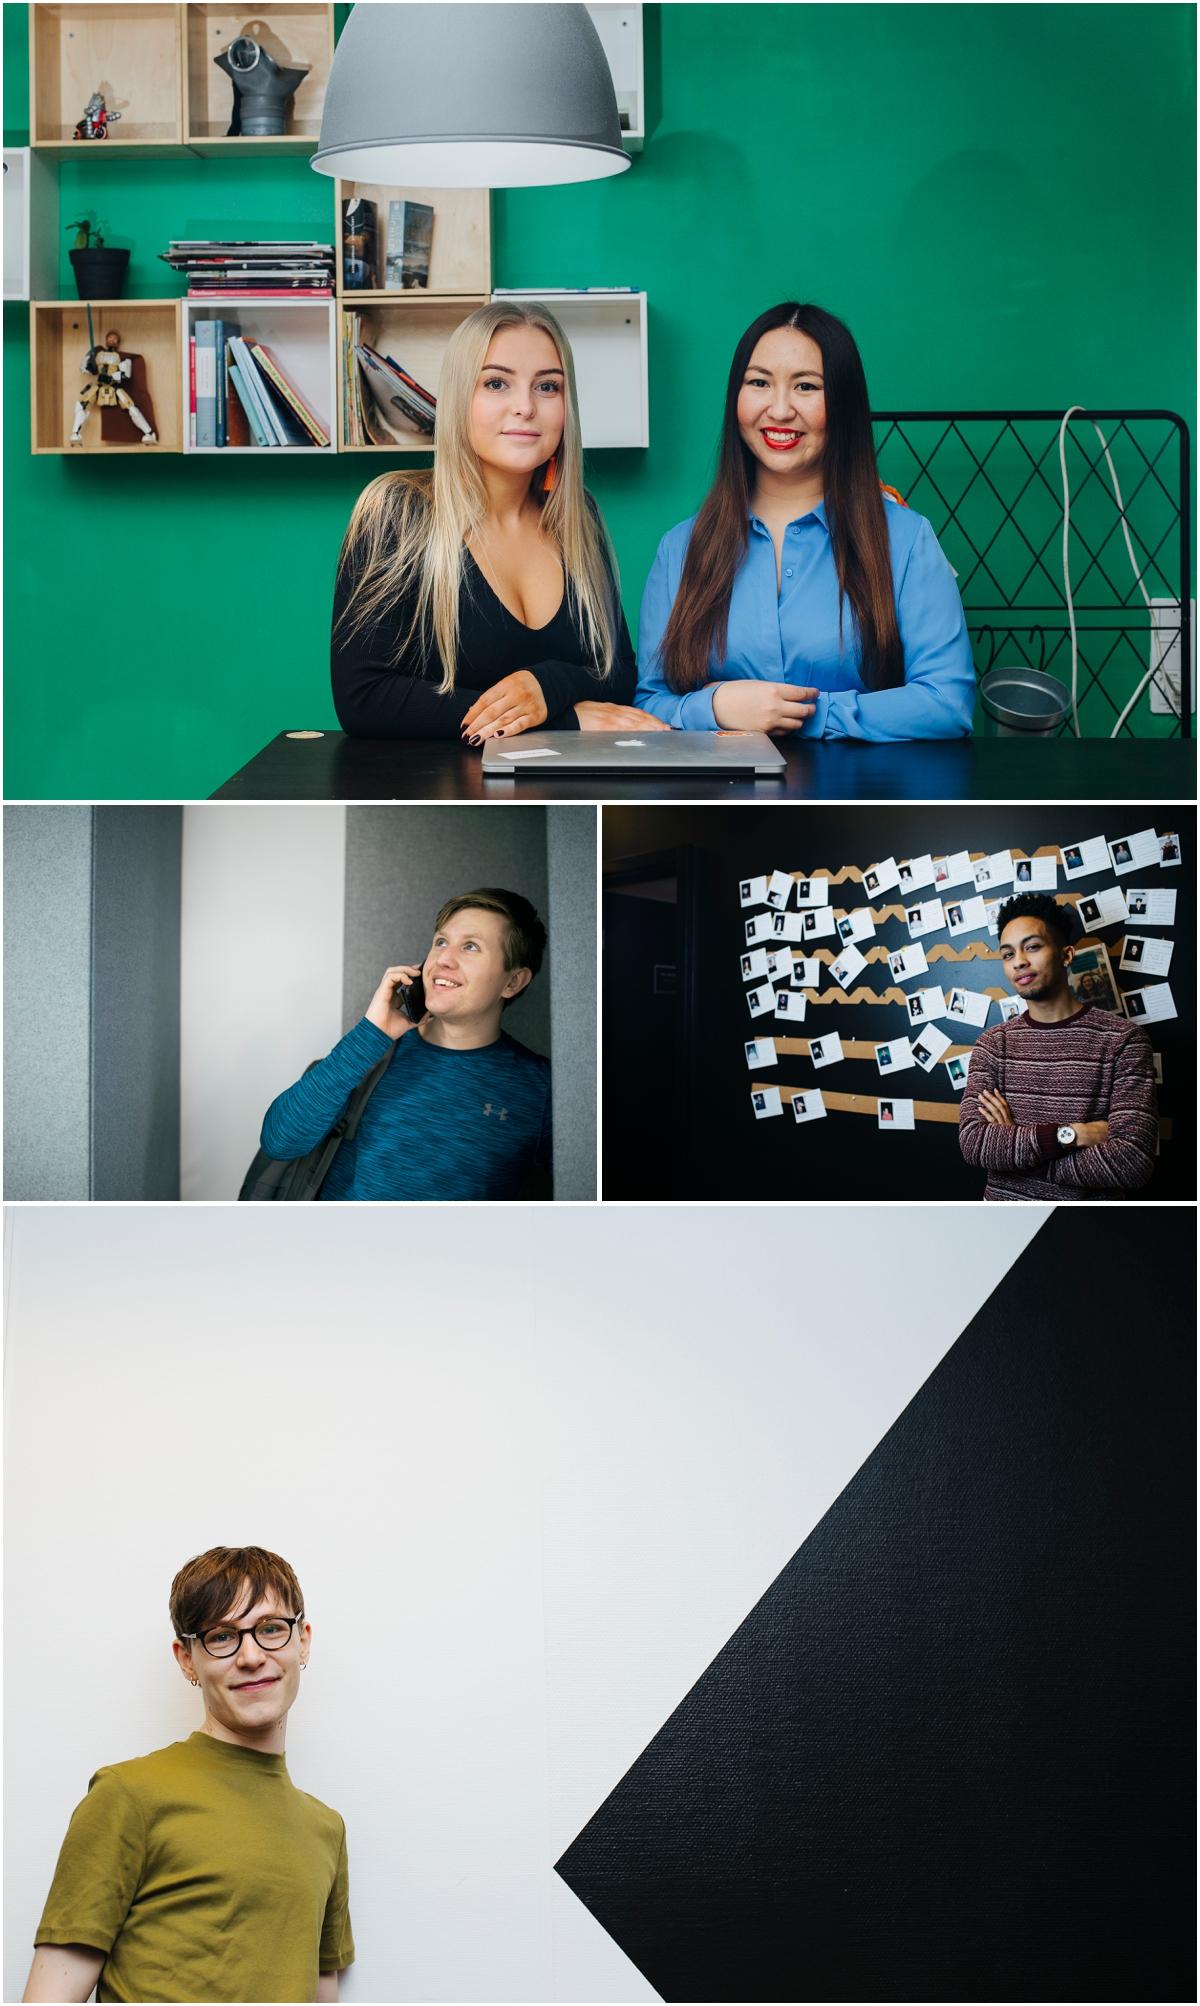 360You-photography-foretagsfotograf-foretagsportratt-stockholm-vallentuna-taby-bildbank-nackademin-6.jpg